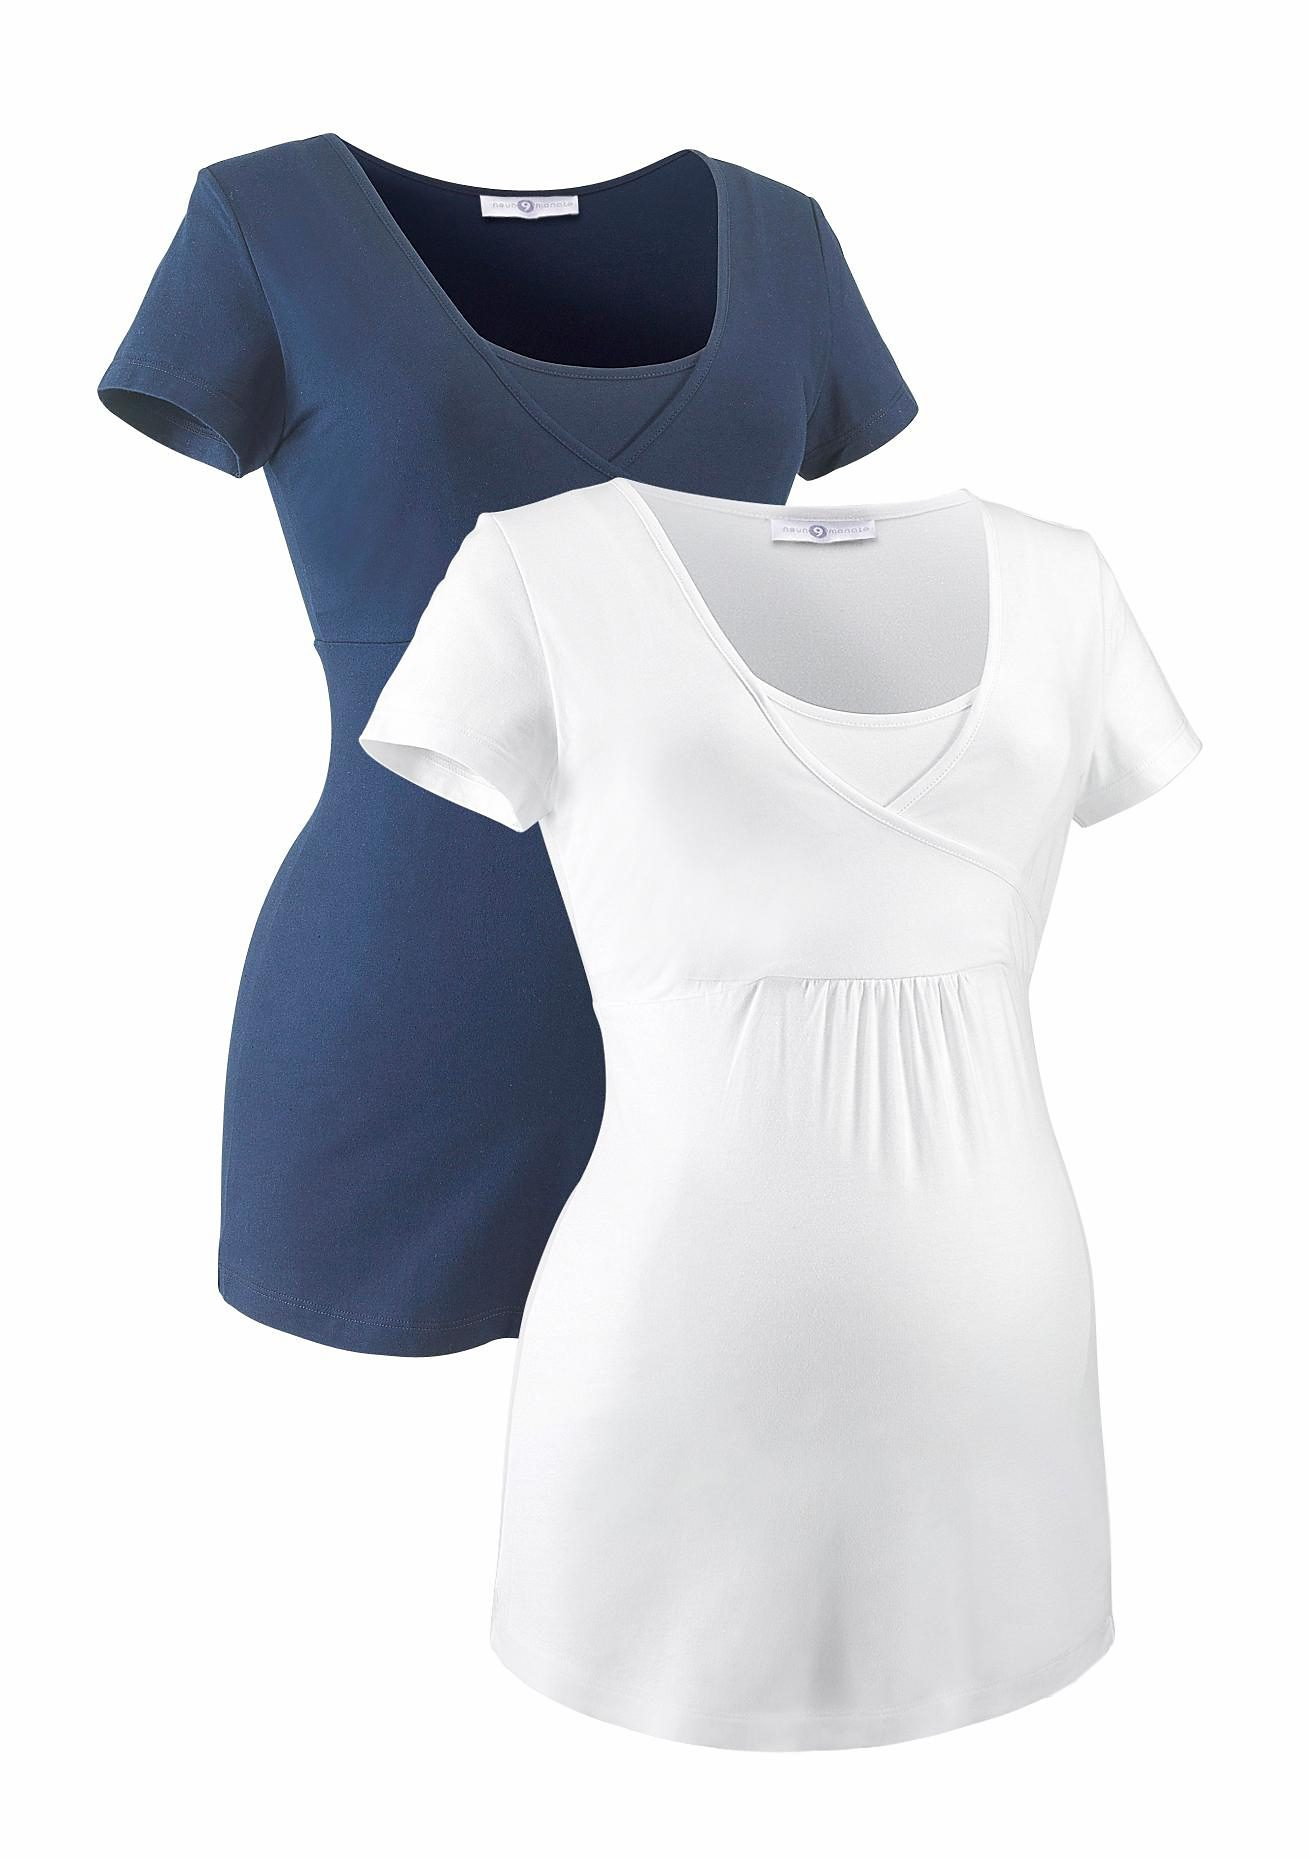 Neun Monate Umstandsshirt (Packung 2 tlg) | Bekleidung > Umstandsmode > Umstandsshirts | Blau | Neun Monate